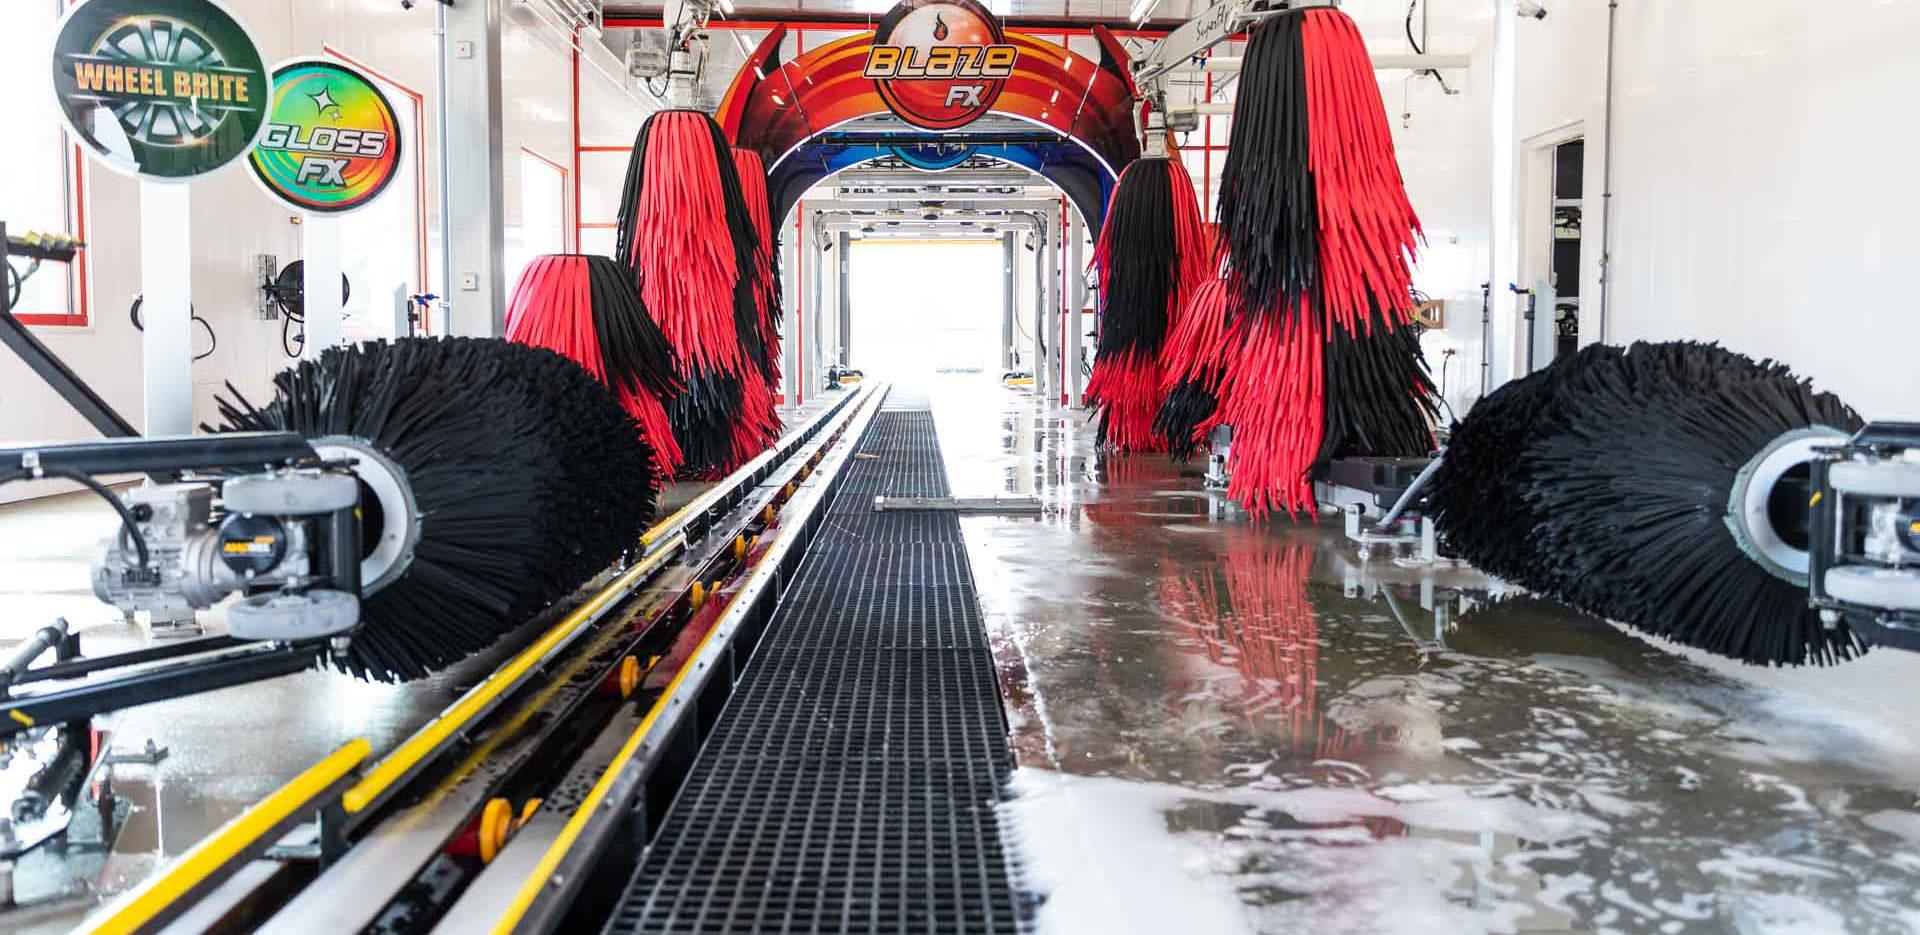 Super Clean Car Wash Web Res-7415.JPG